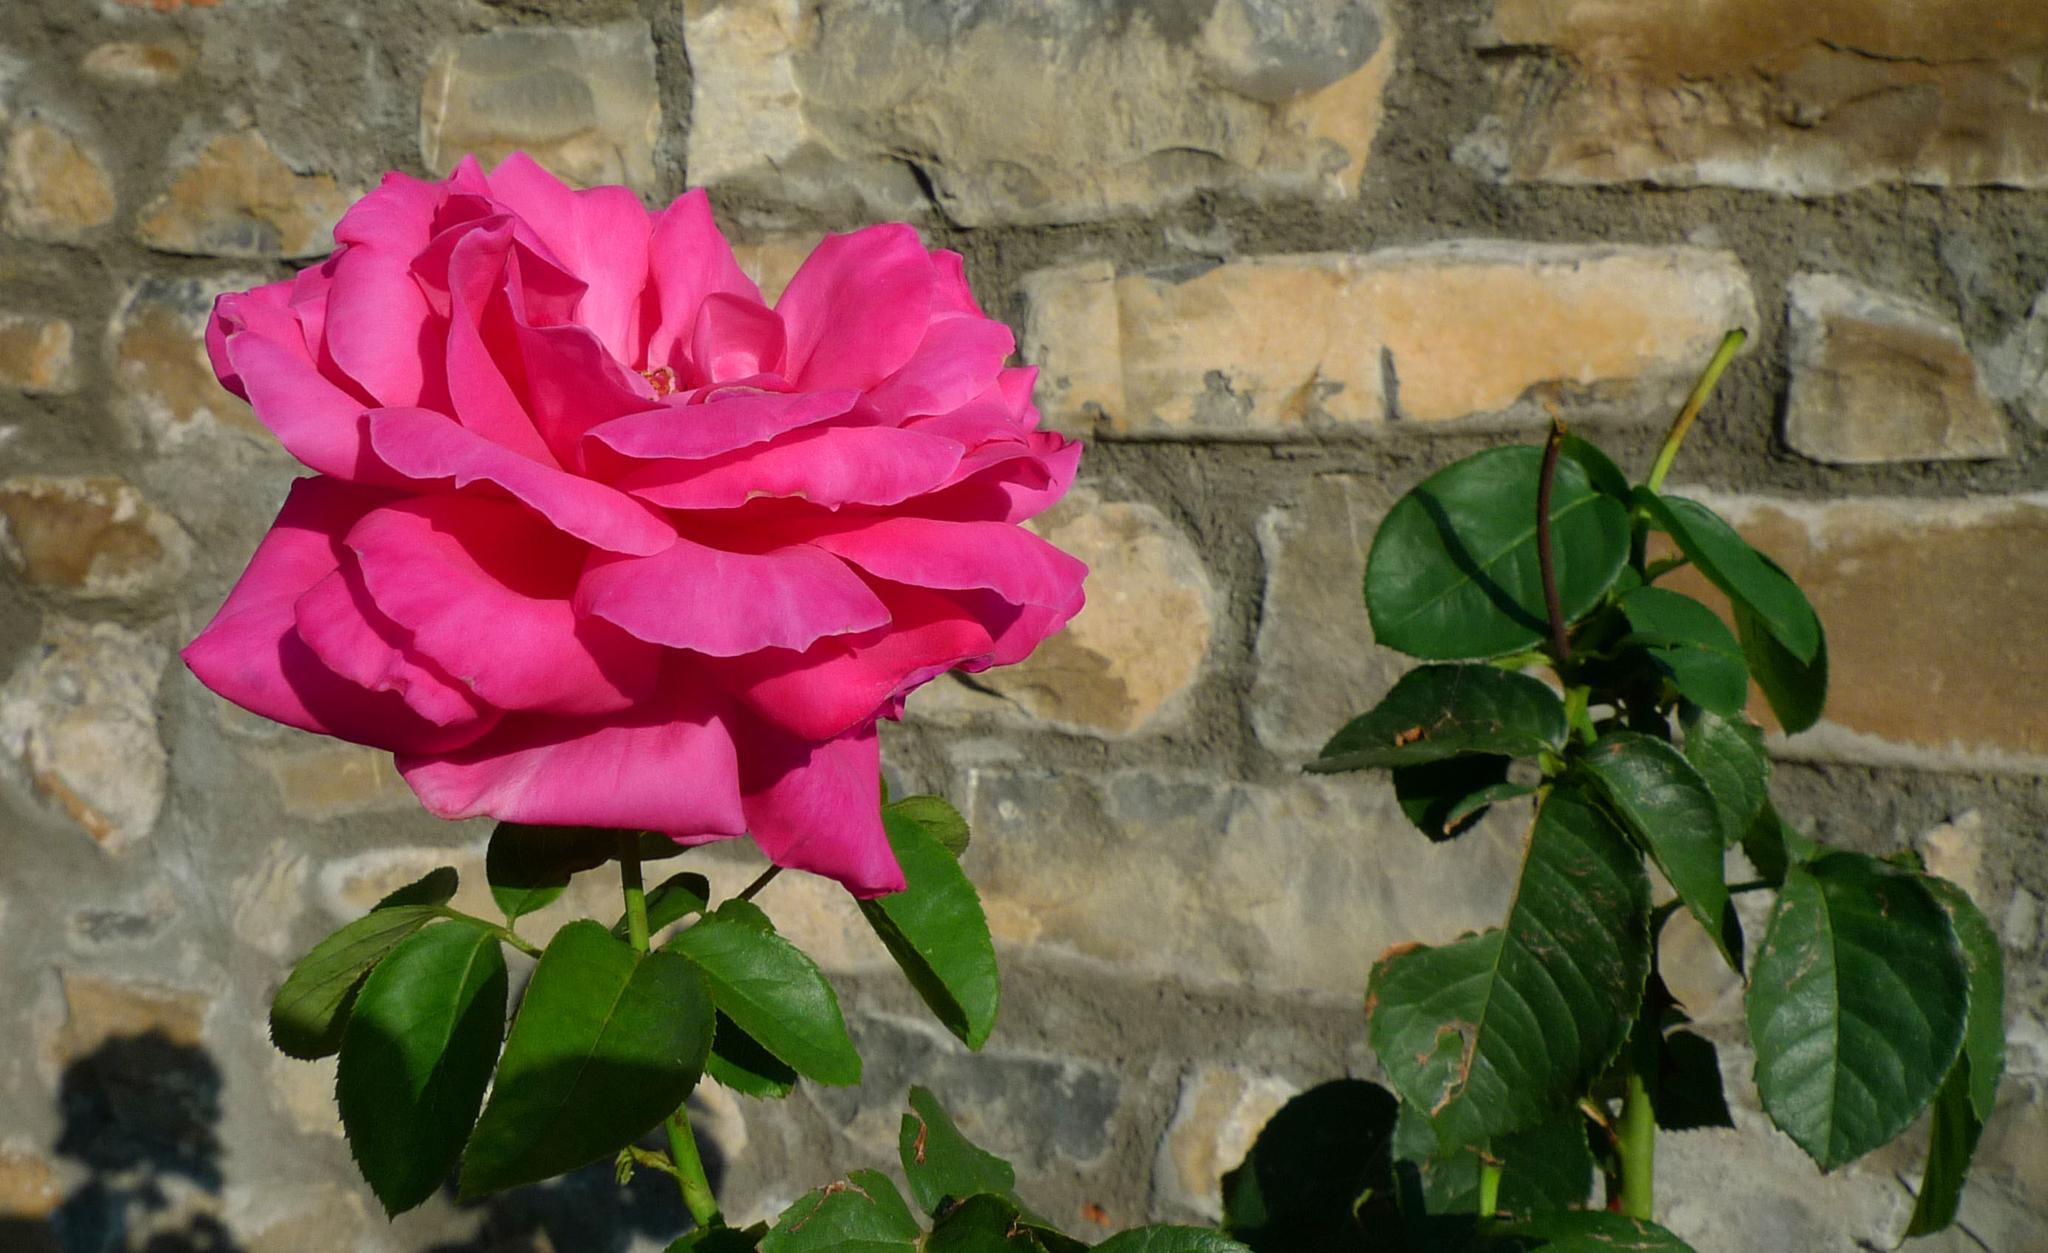 Una rosa. Echo (Huesca) by bescosx